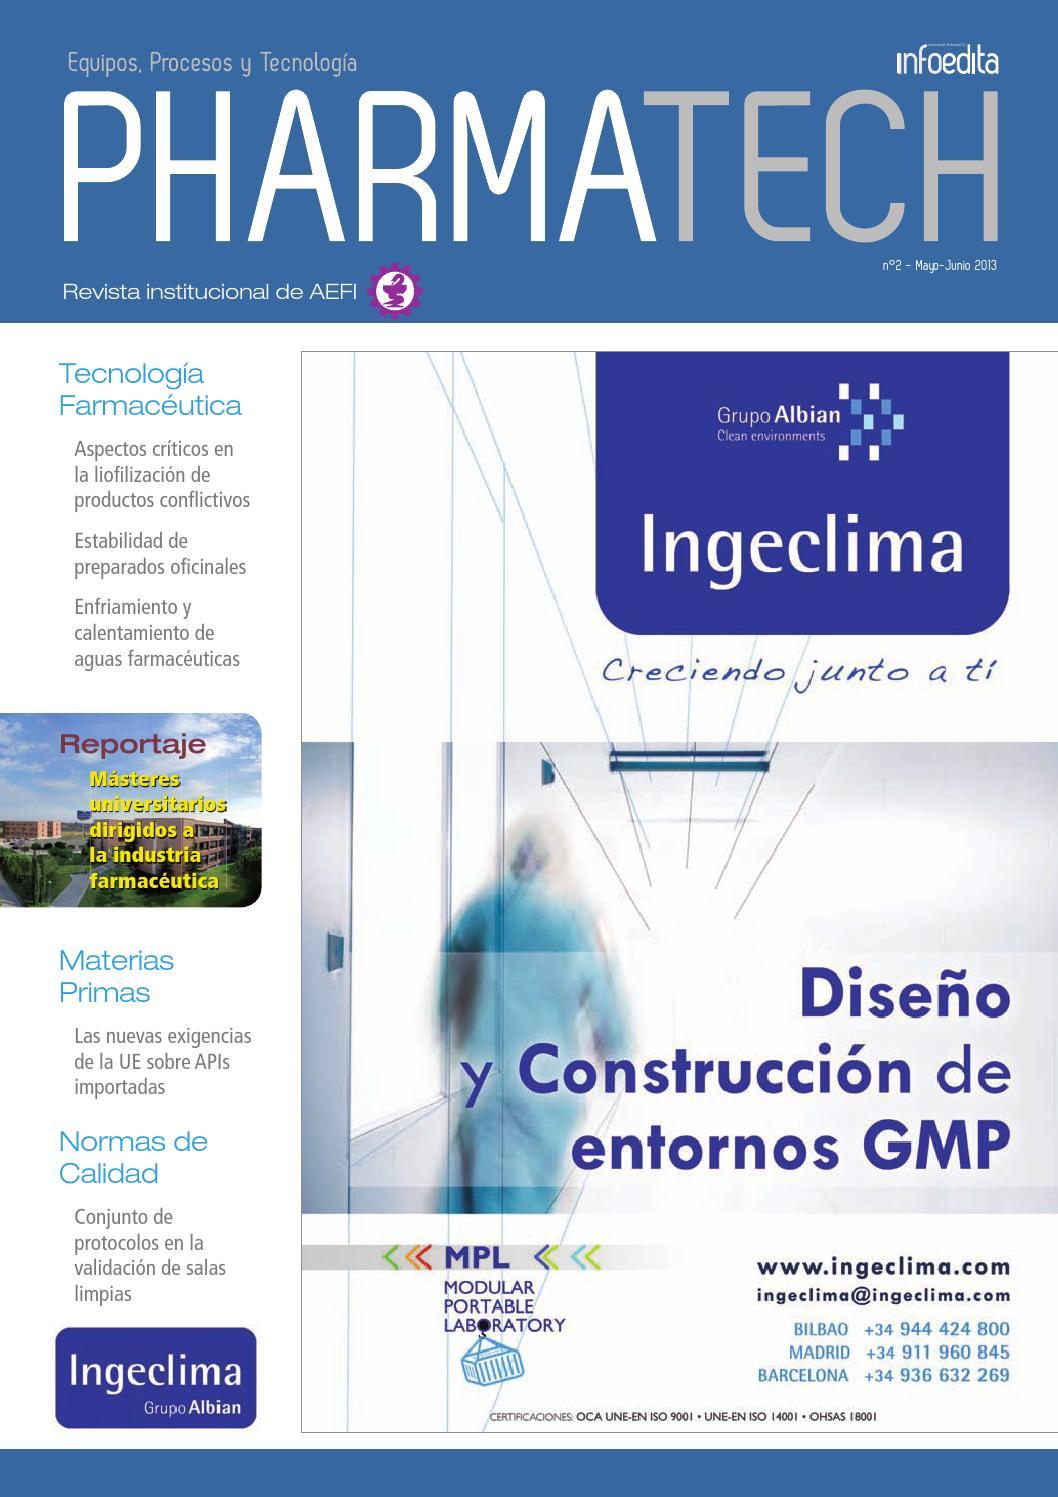 Pharmatech Mayo/Junio 2013 by Infoedita Comunicacion Profesional - issuu